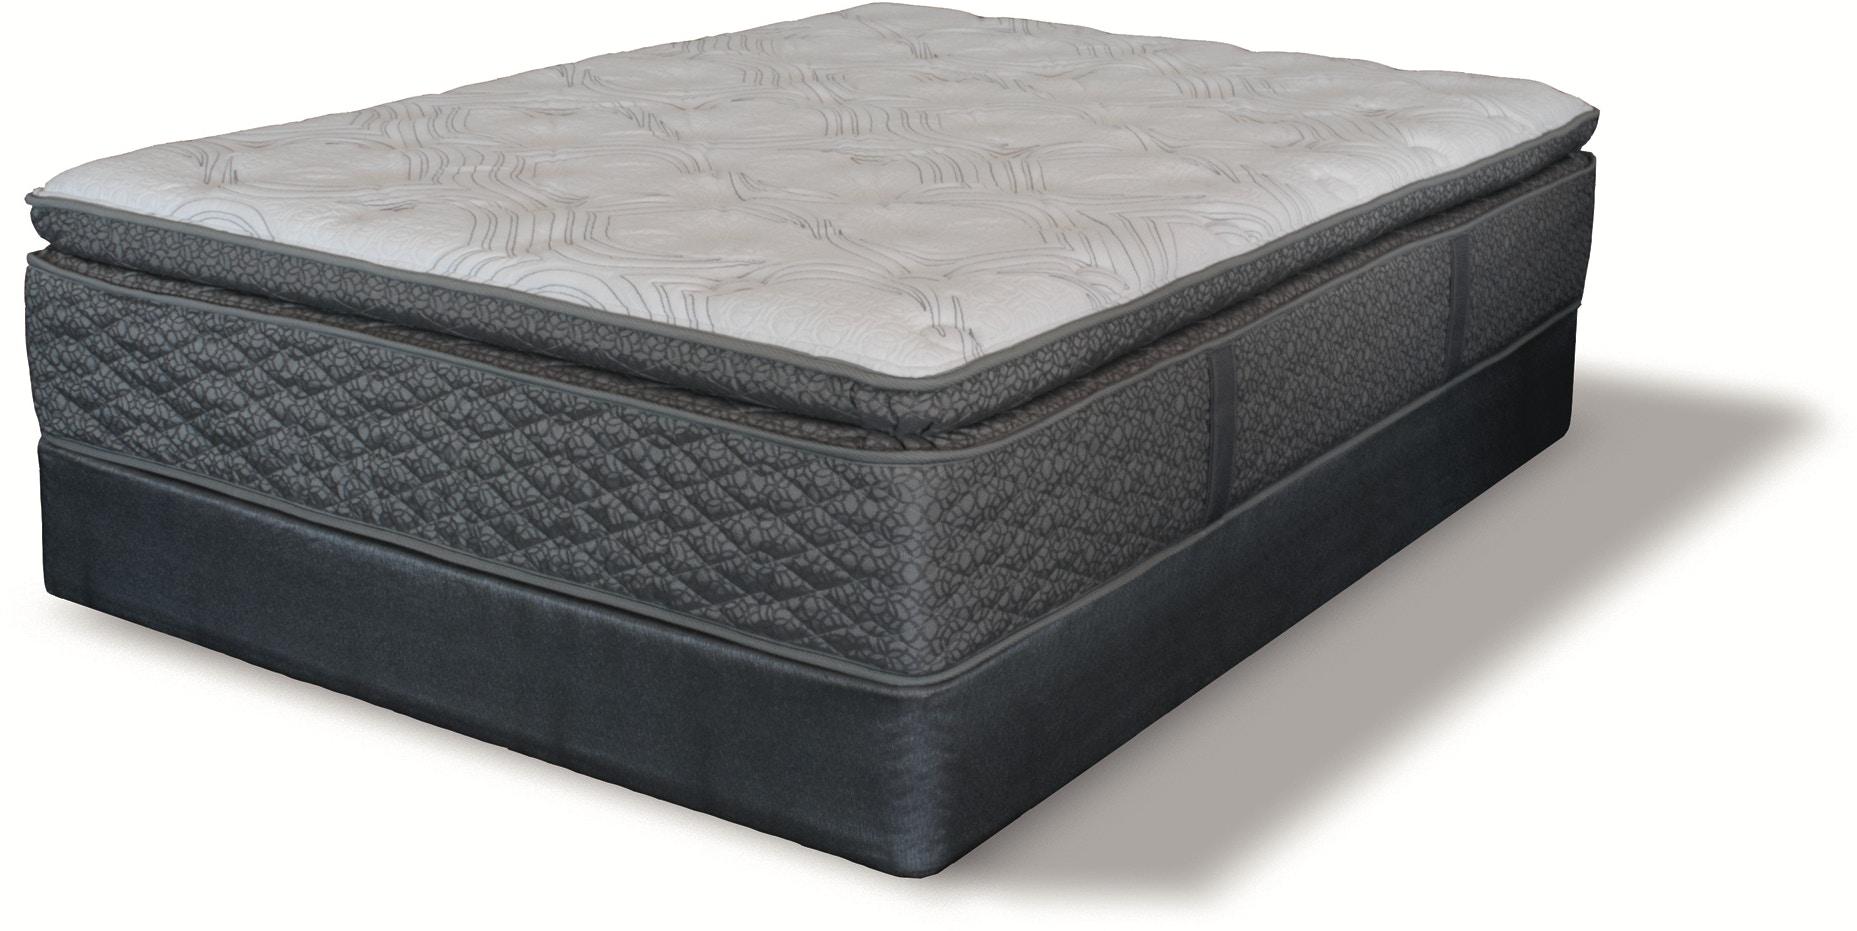 of beautyrest chesapeake queen bay more plush mattress pillow badcock picture top